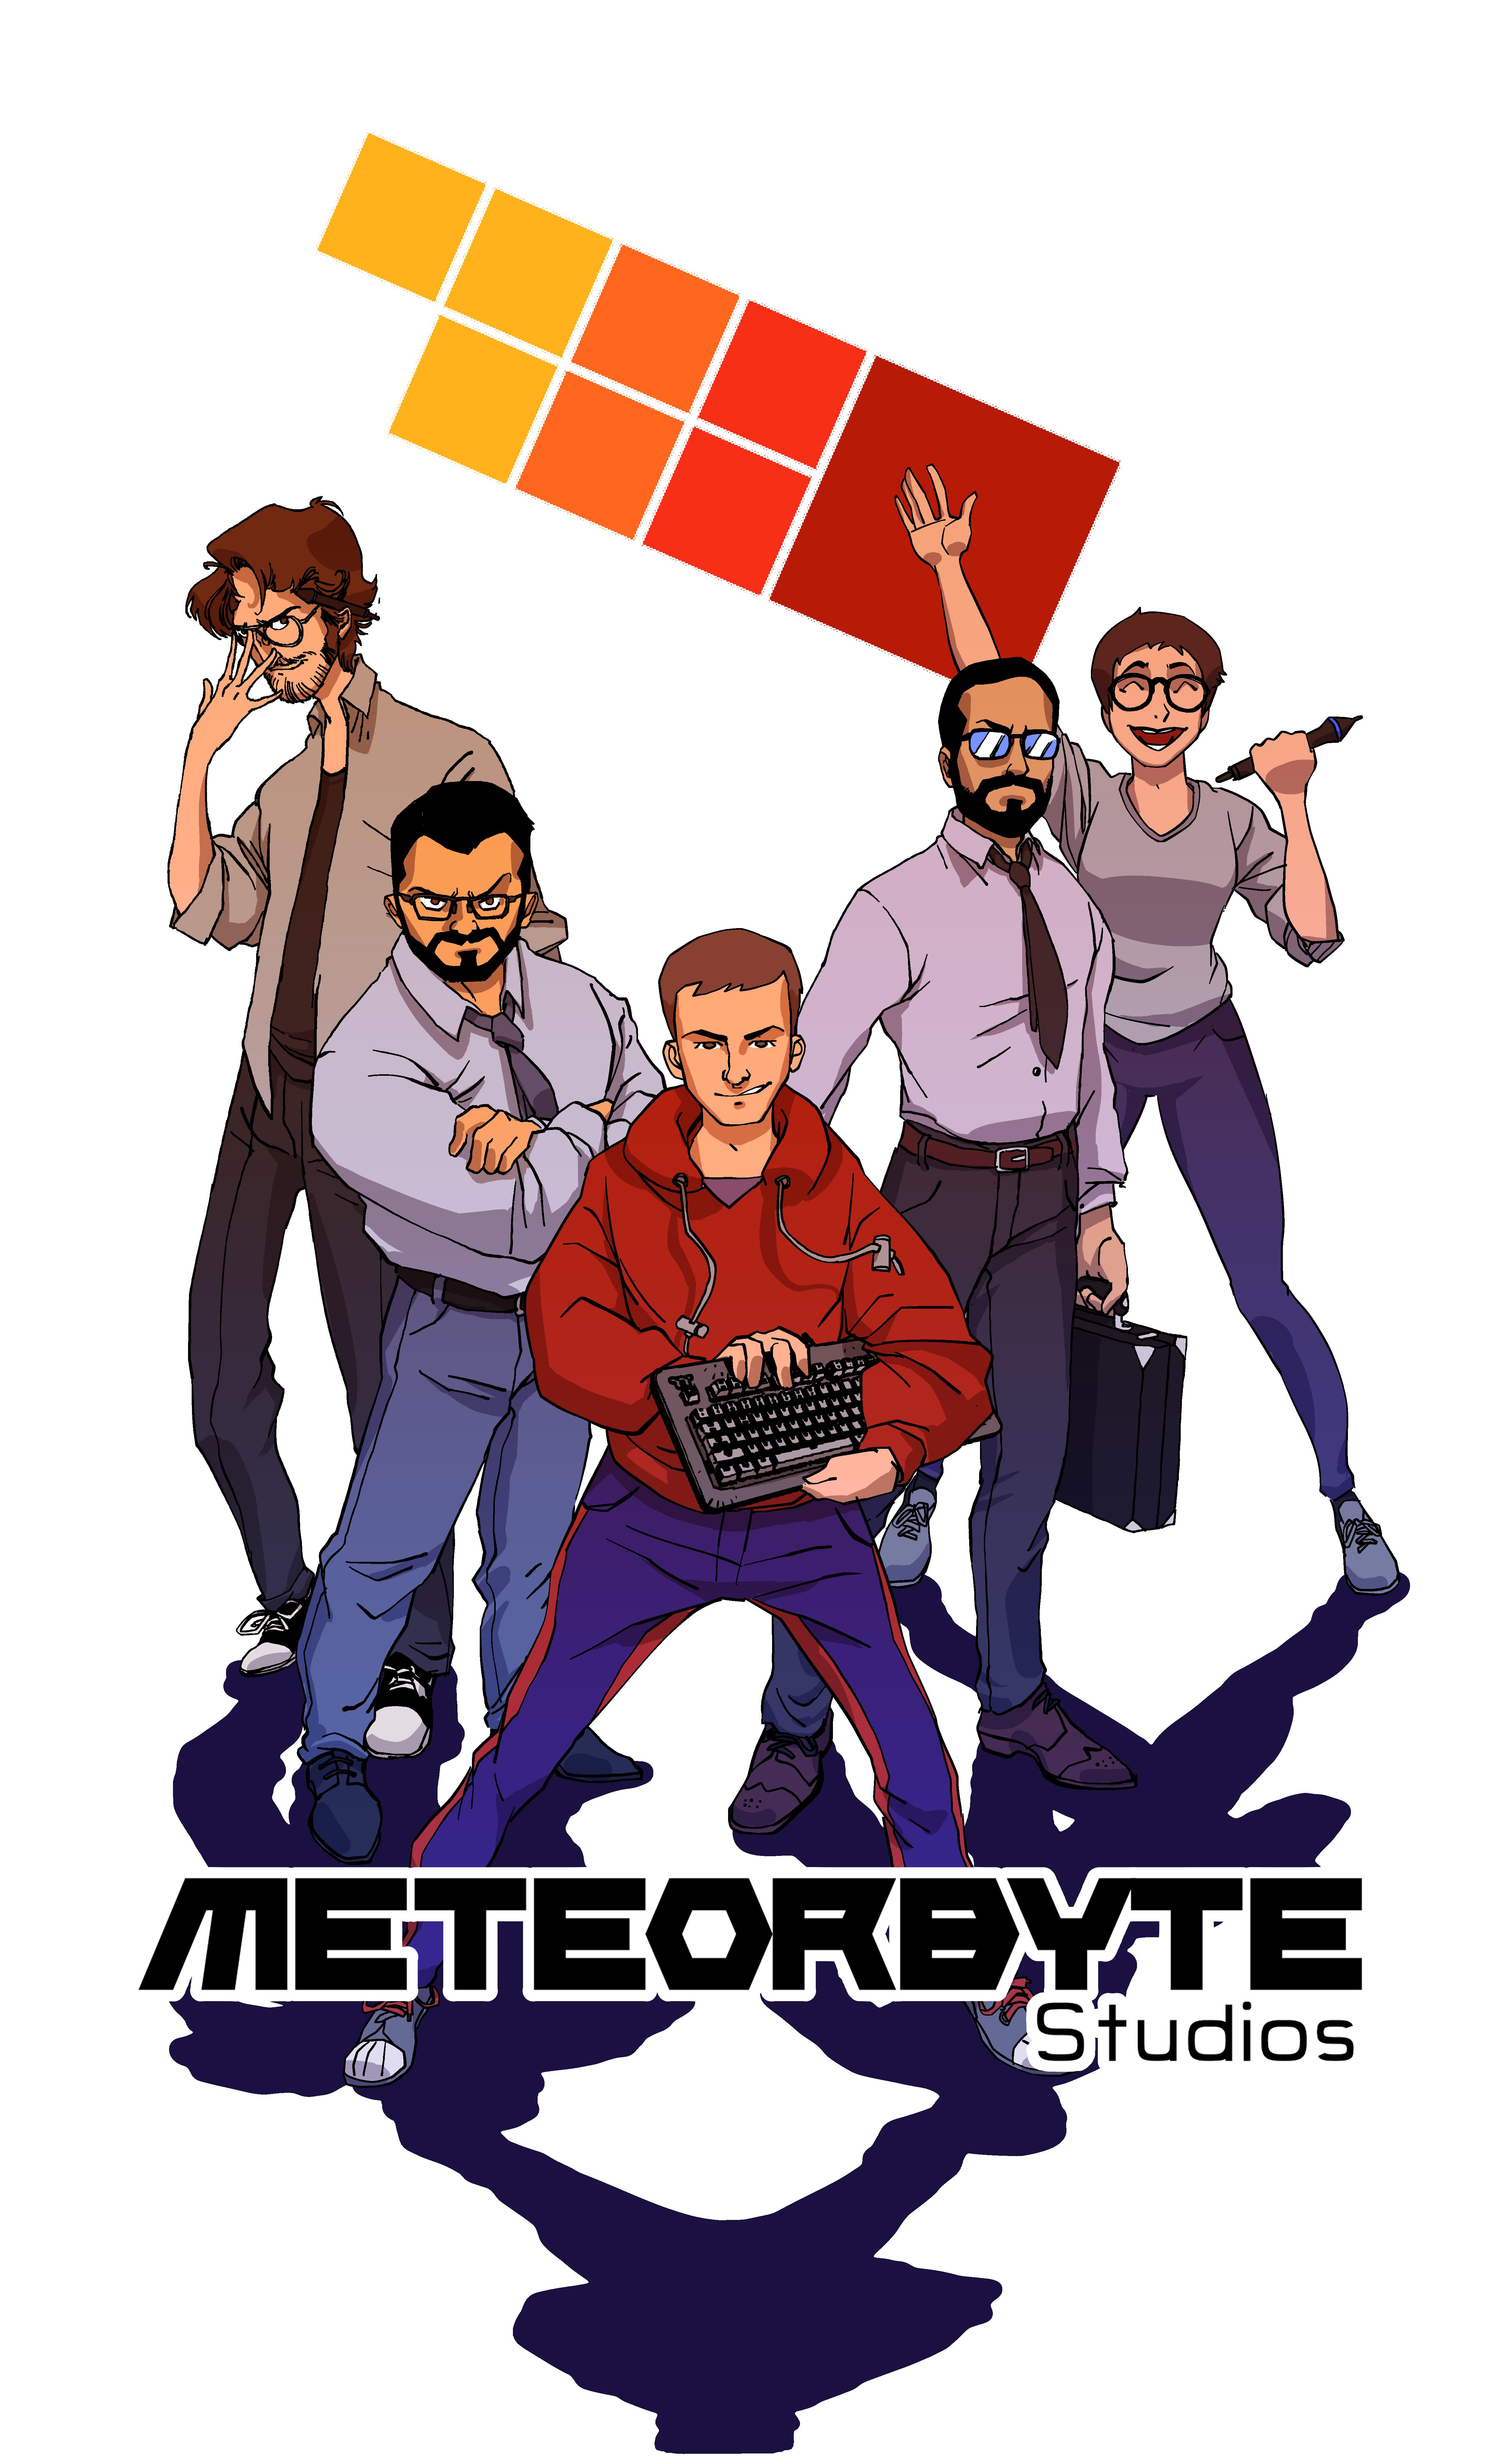 MeteorbyteAnime